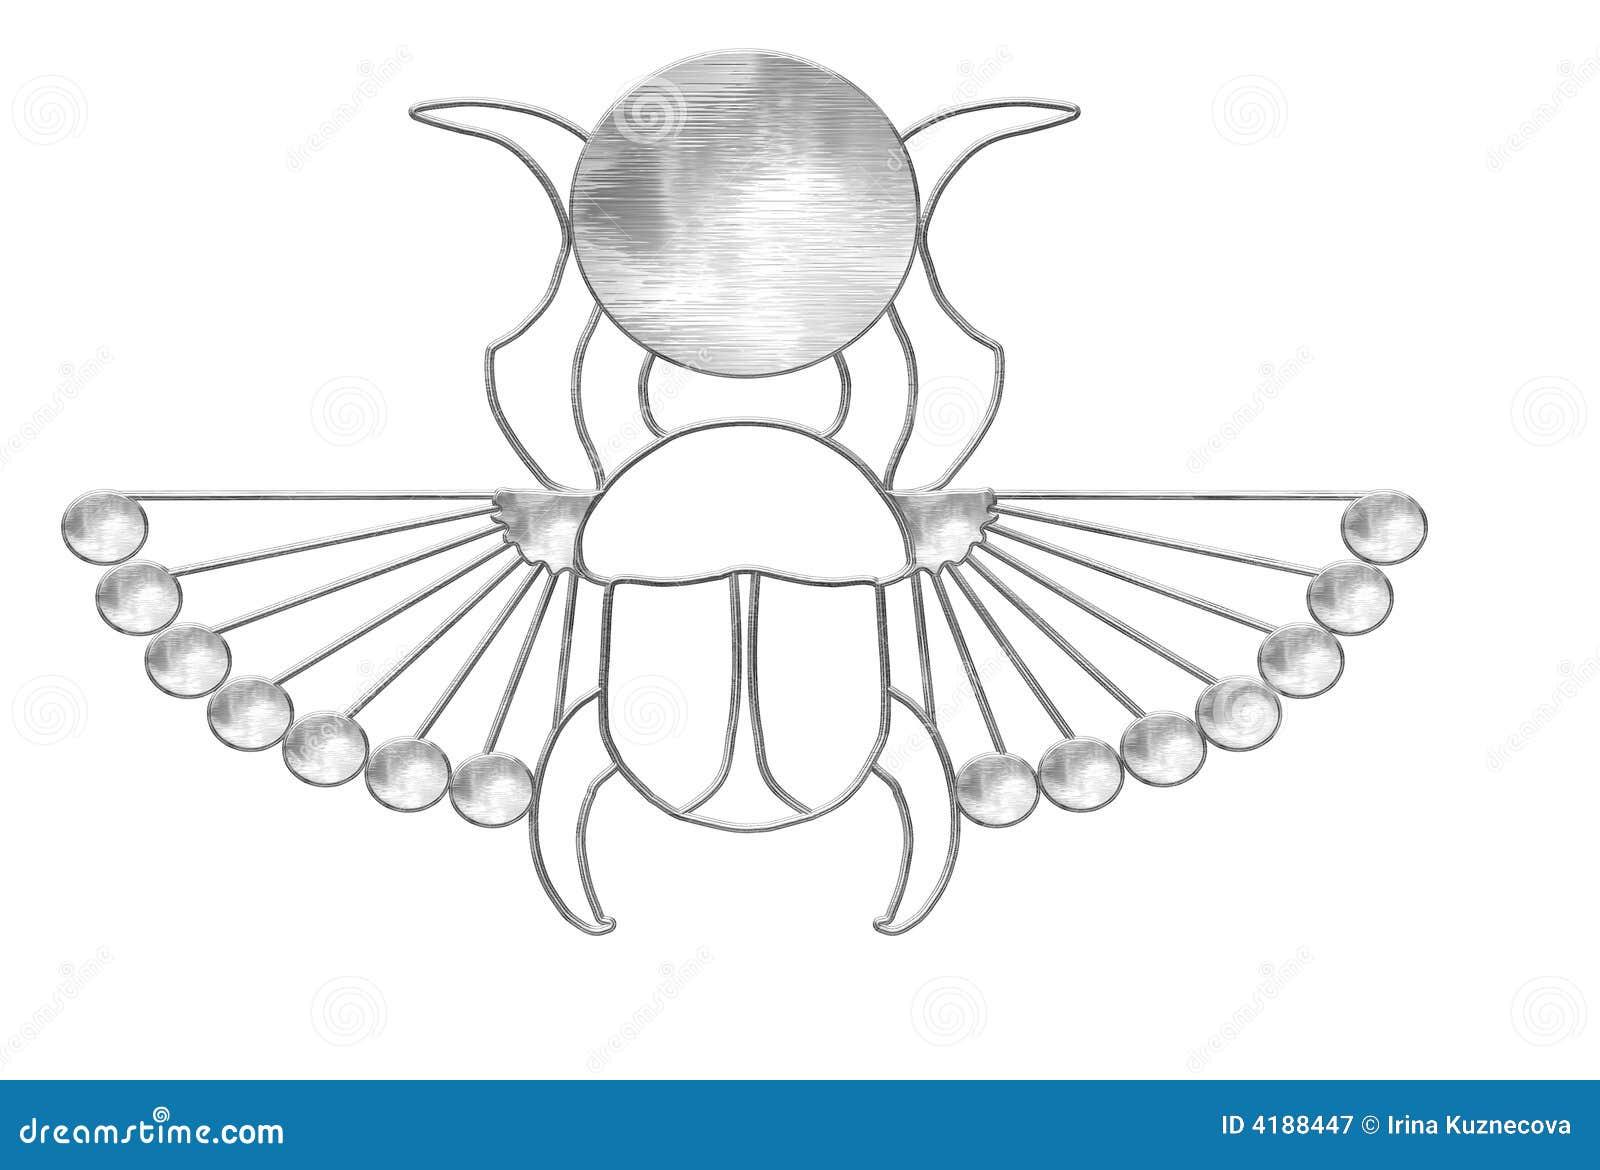 Pharaoh scarab